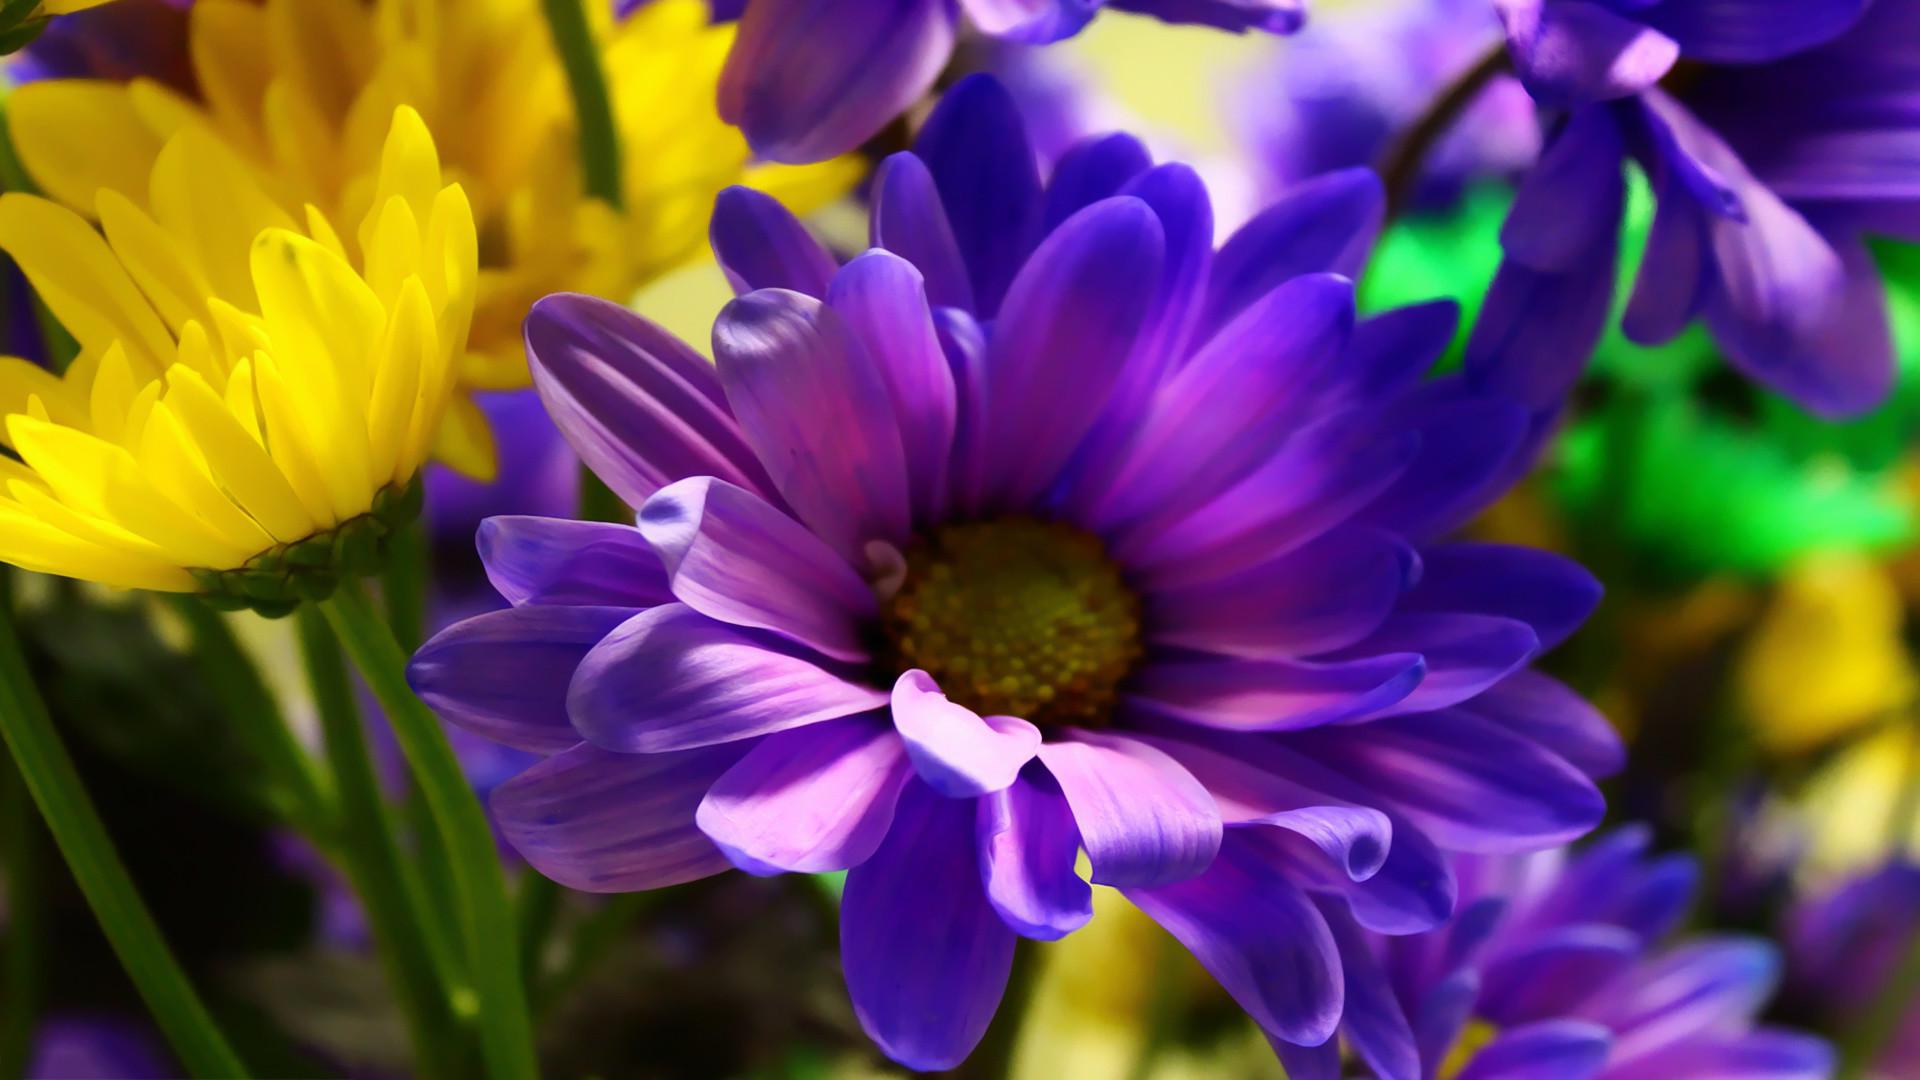 May Flowers Wallpaper HD Desktop (66+ images)